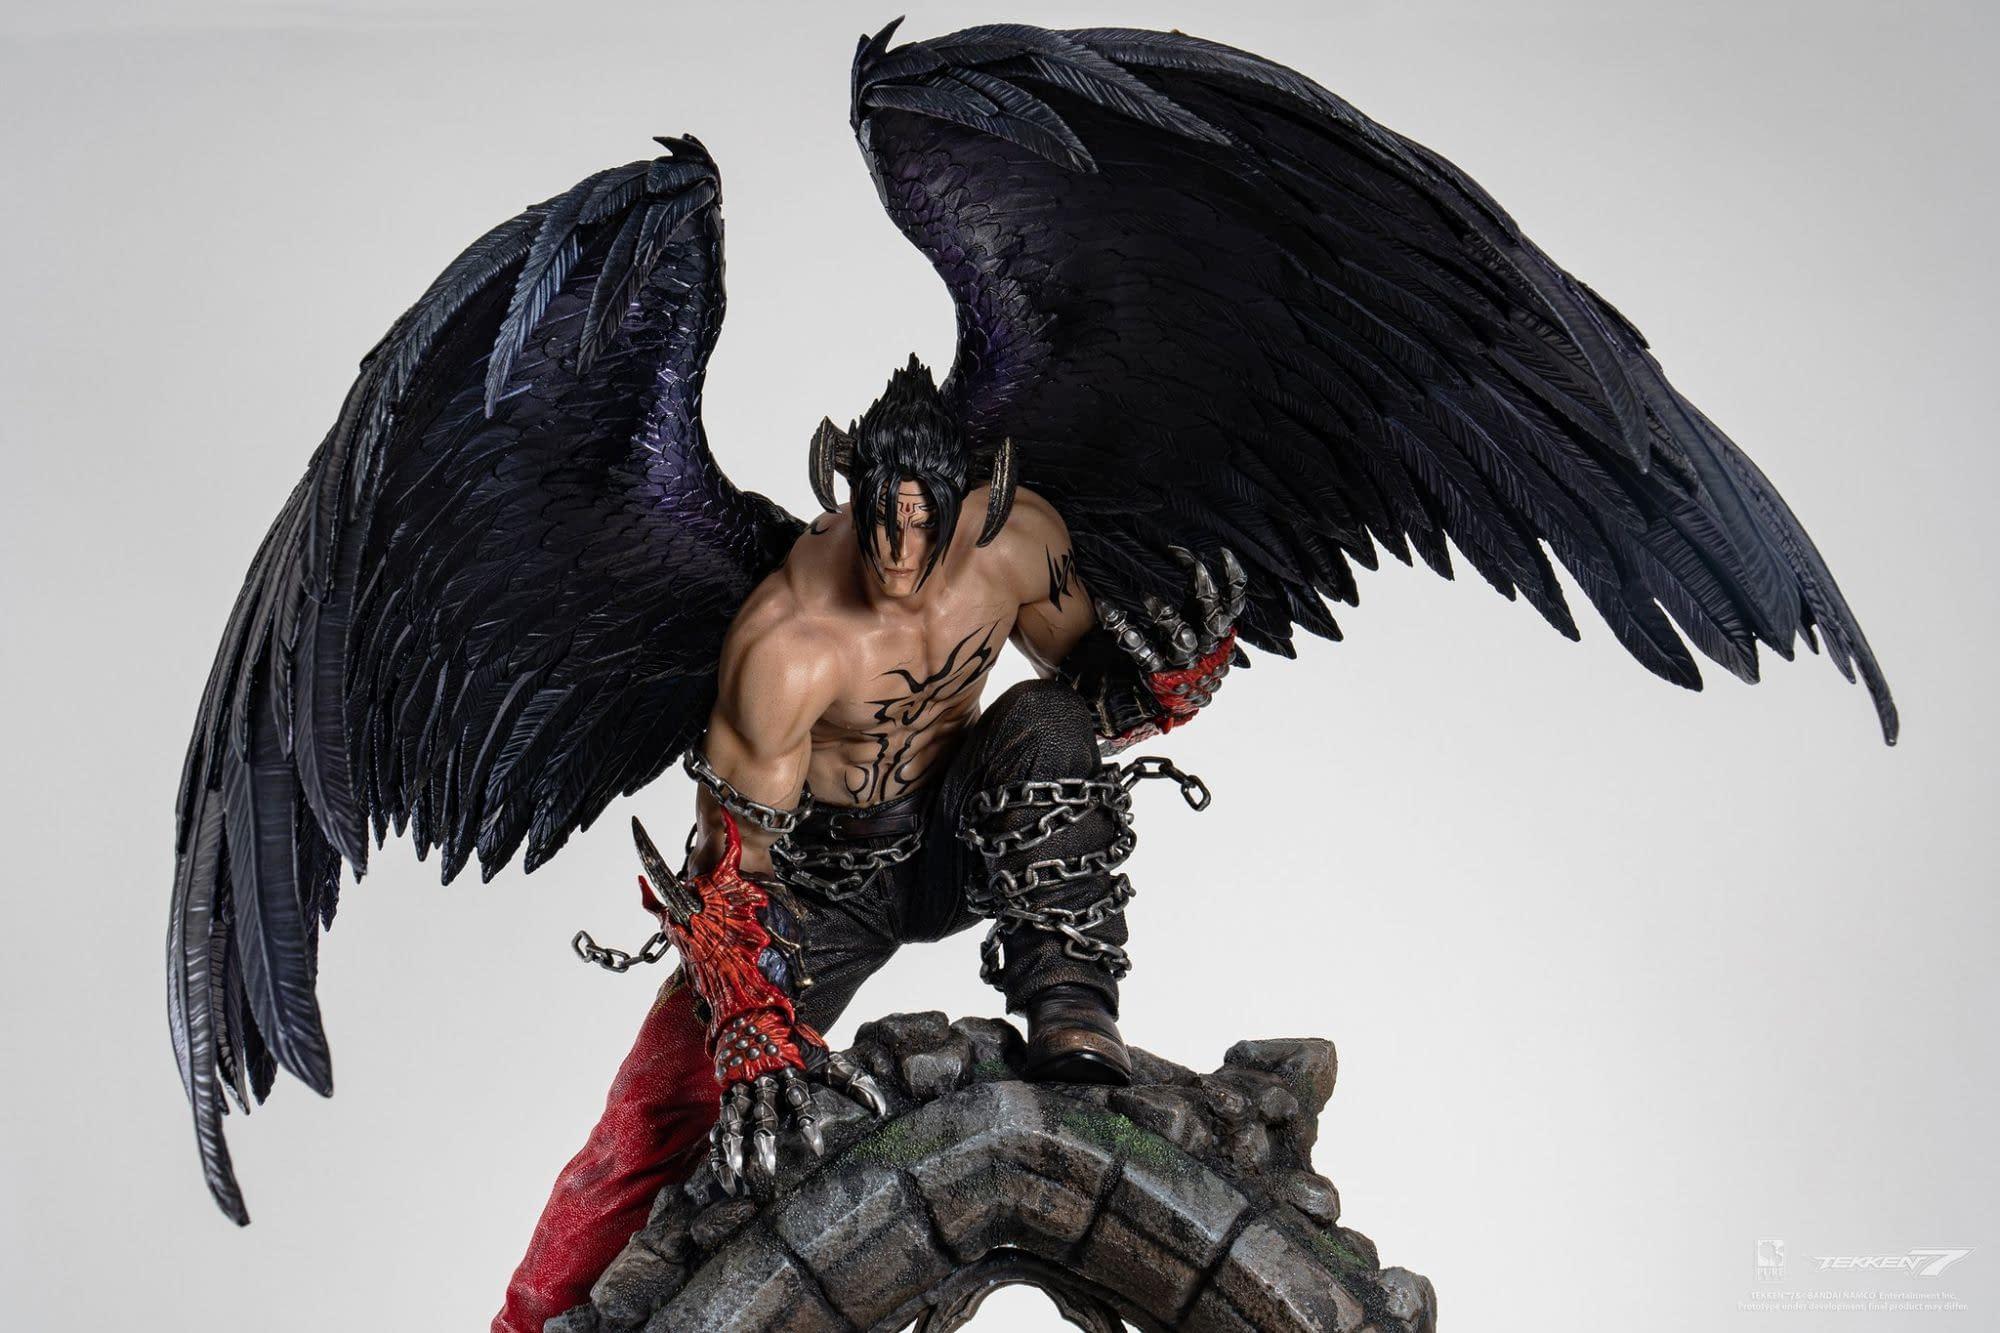 Tekken 7 Gets A Special Devil Jin Statue From Pure Arts